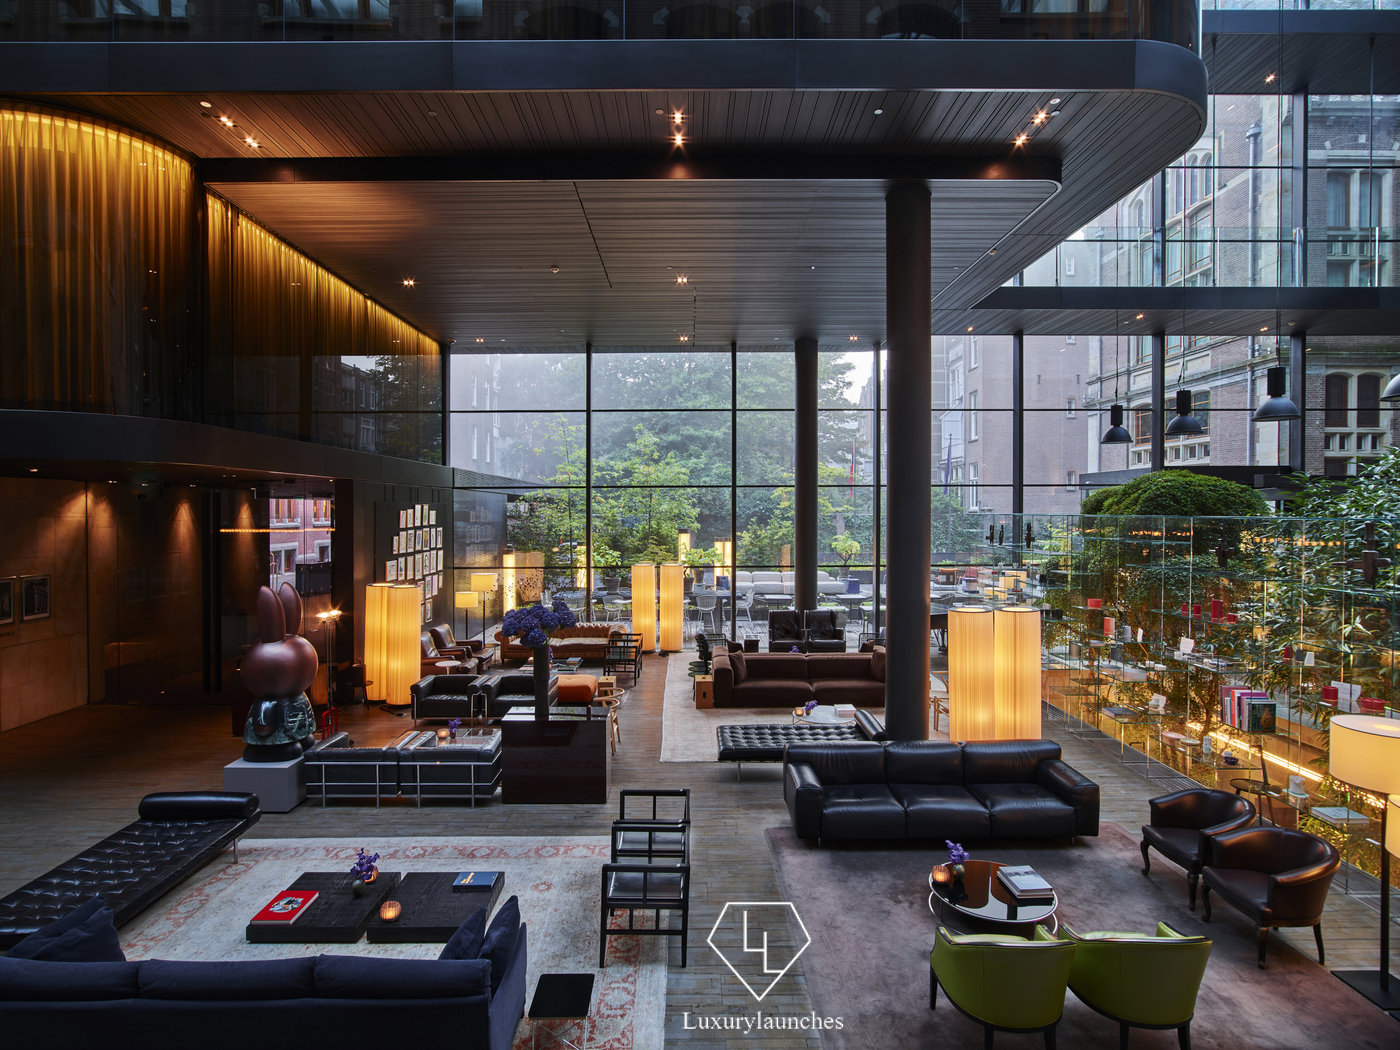 Conservatorium-Hotel-Lounge.jpg (1400×1050)